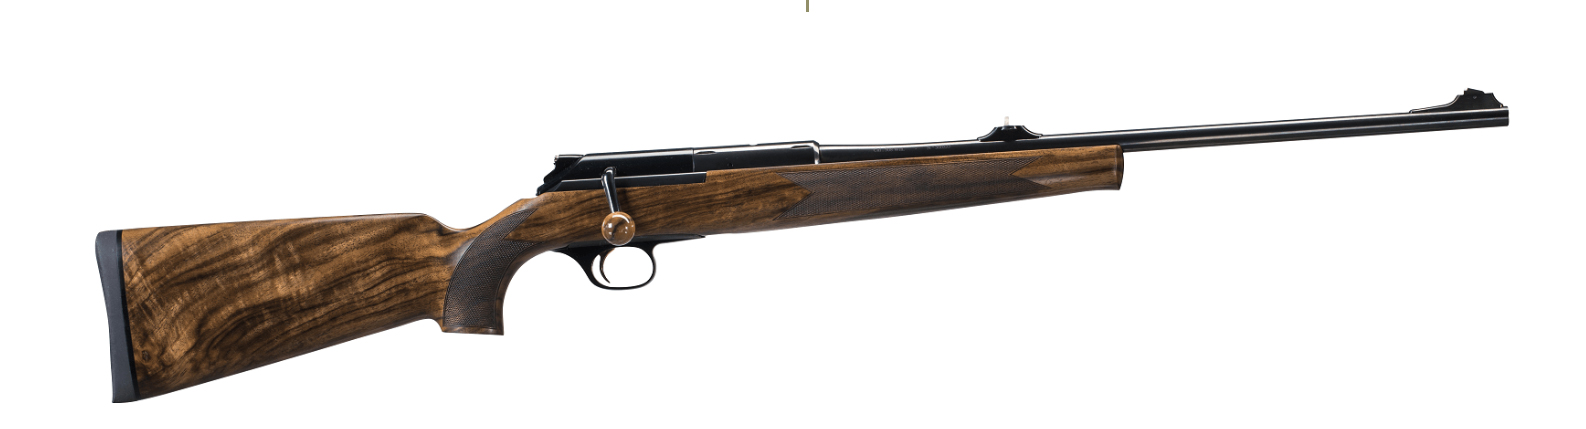 chapuis rols elegance carabina da caccia